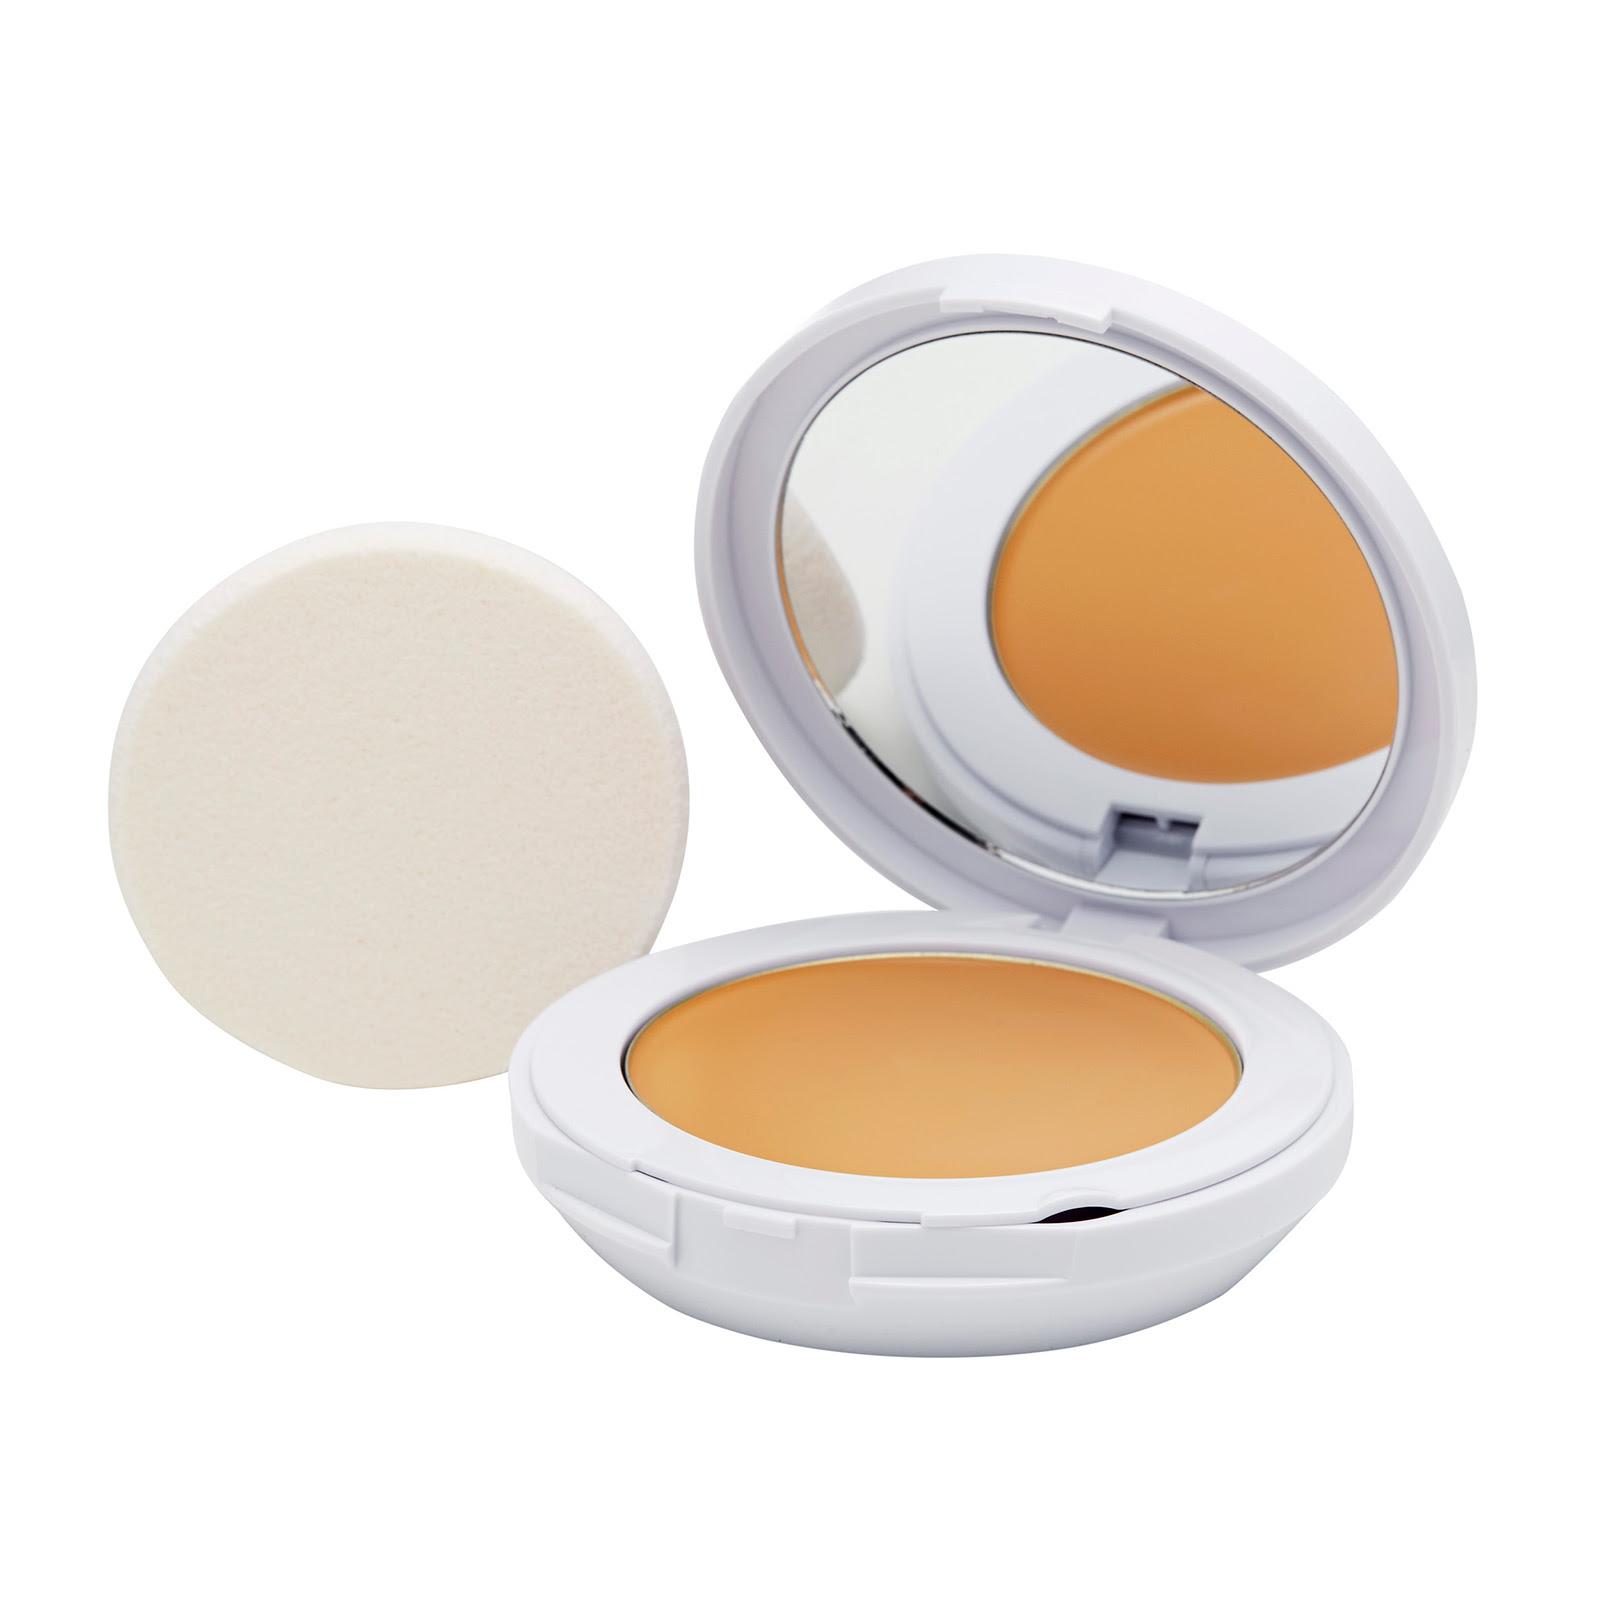 Embryolisse Artist Secret Compact Foundation Cream SPF 20